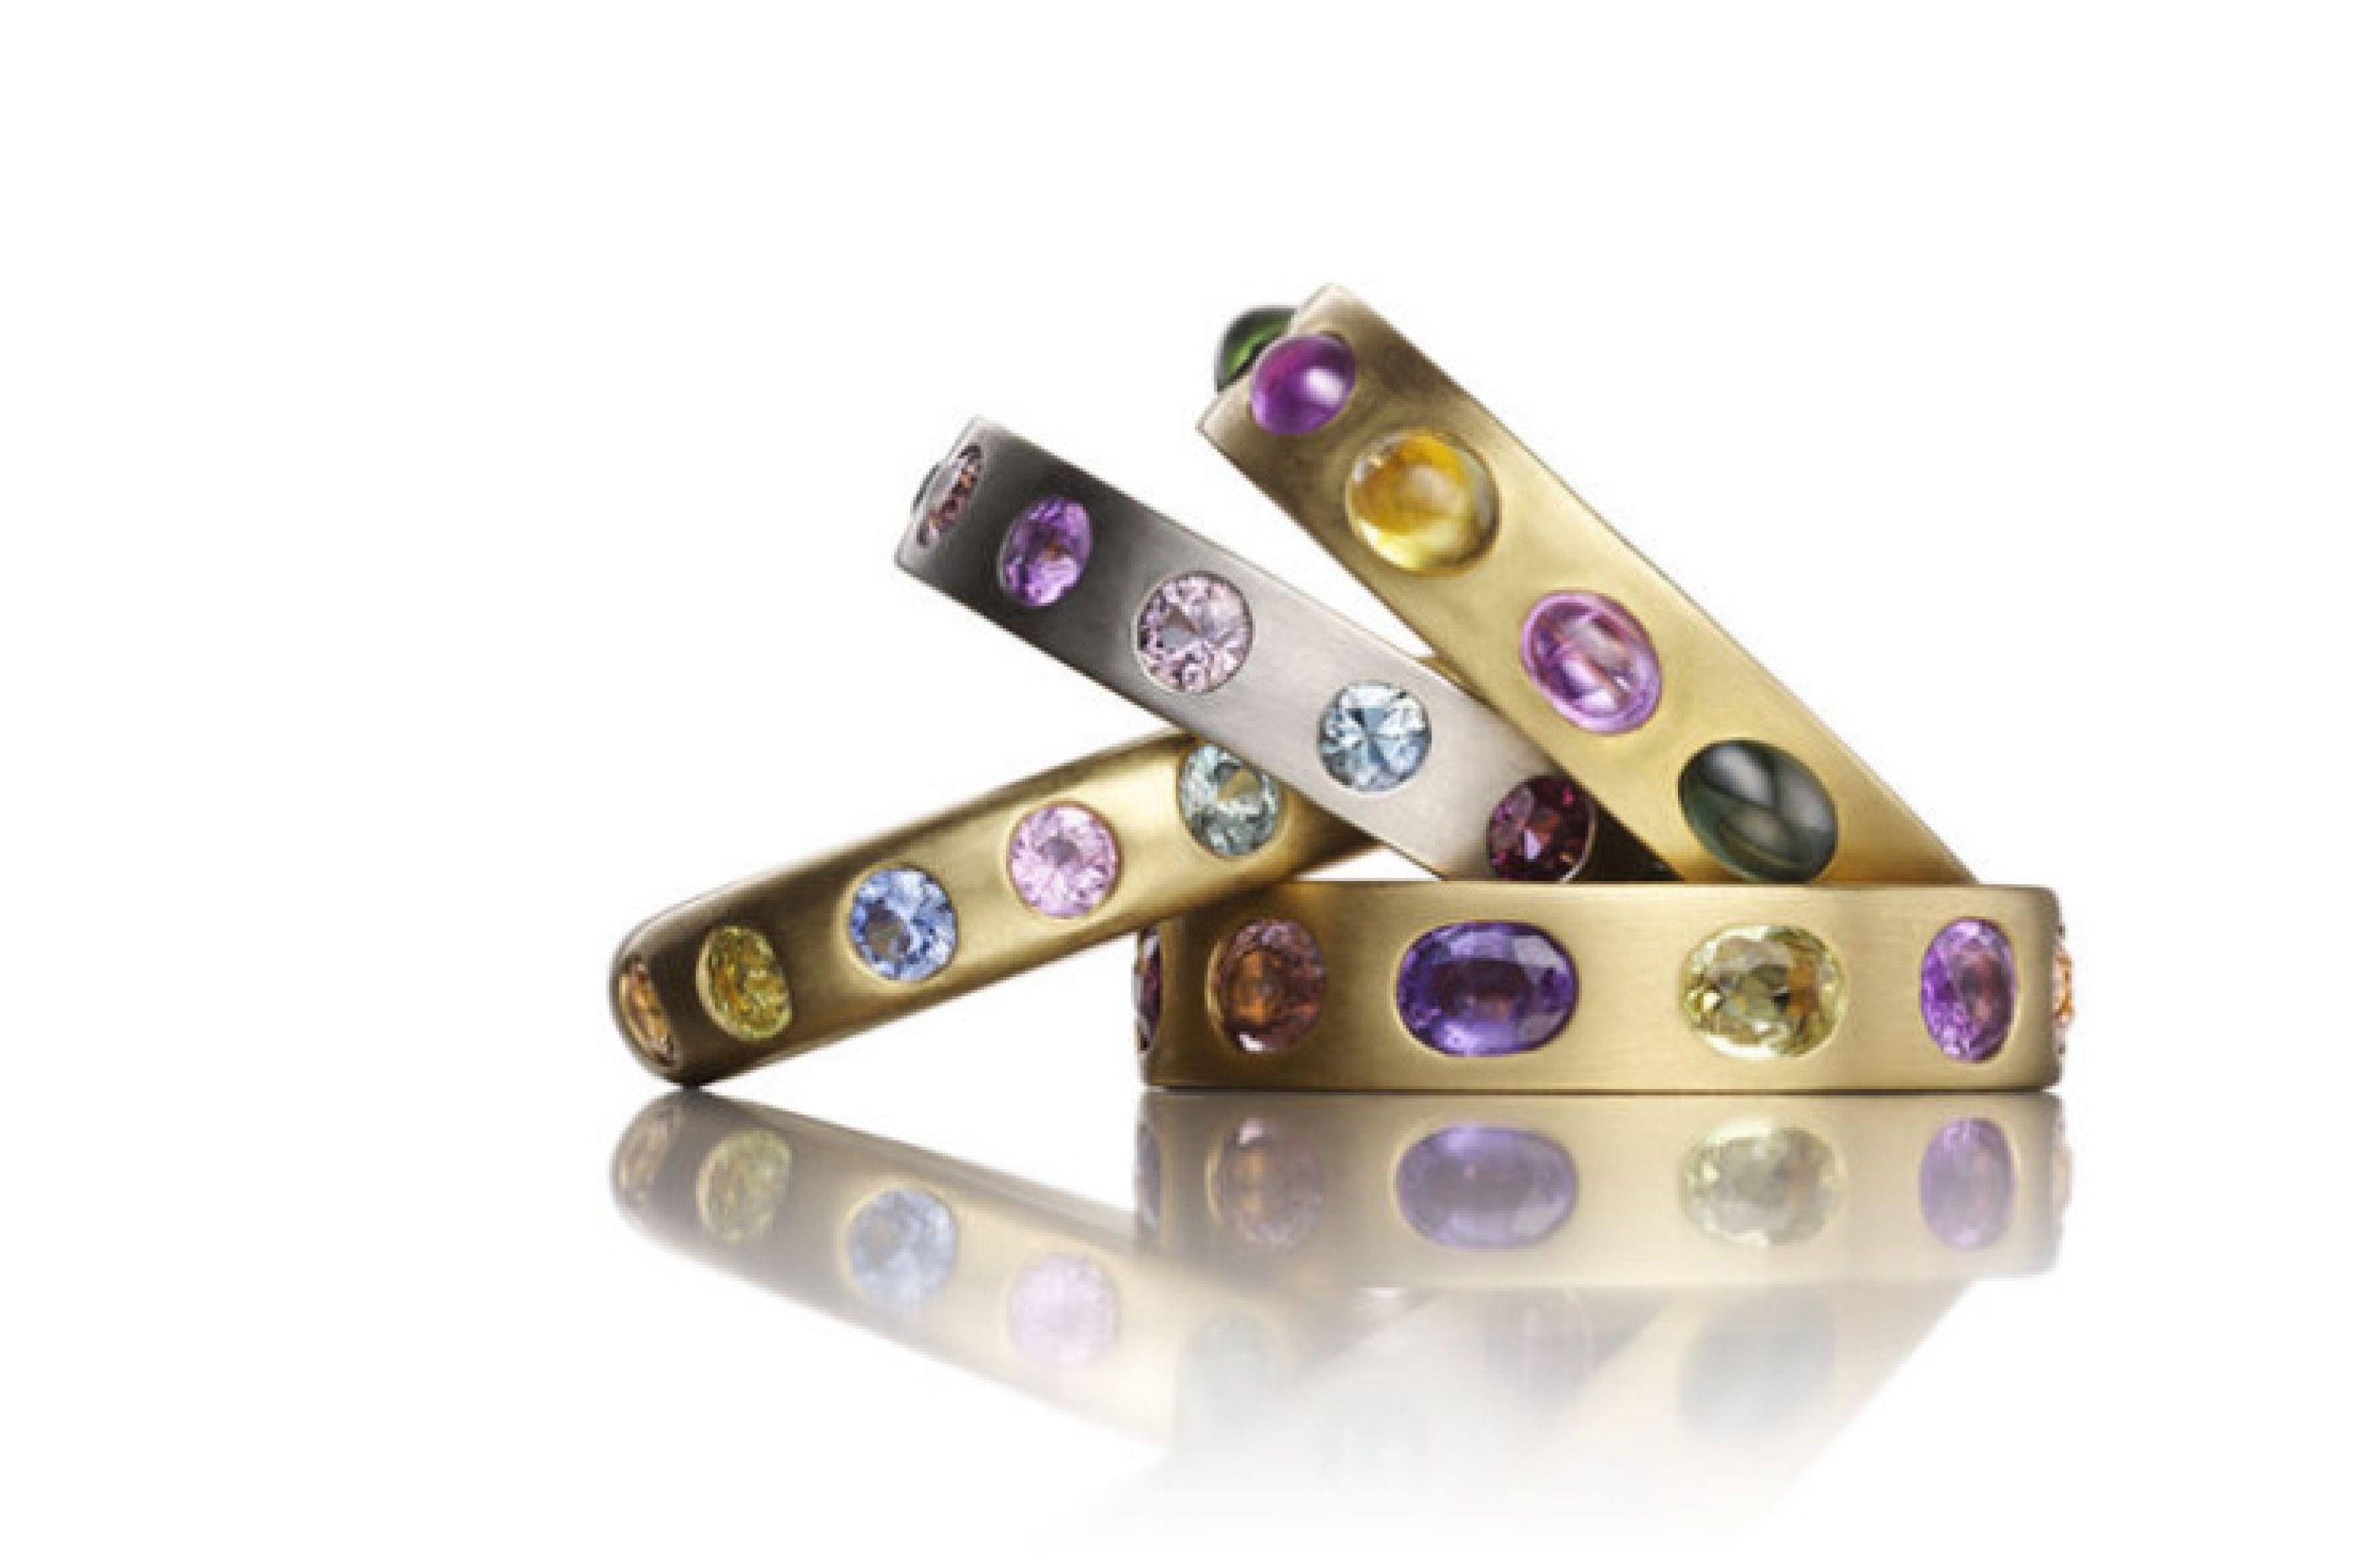 JewelryWhite_17.jpg